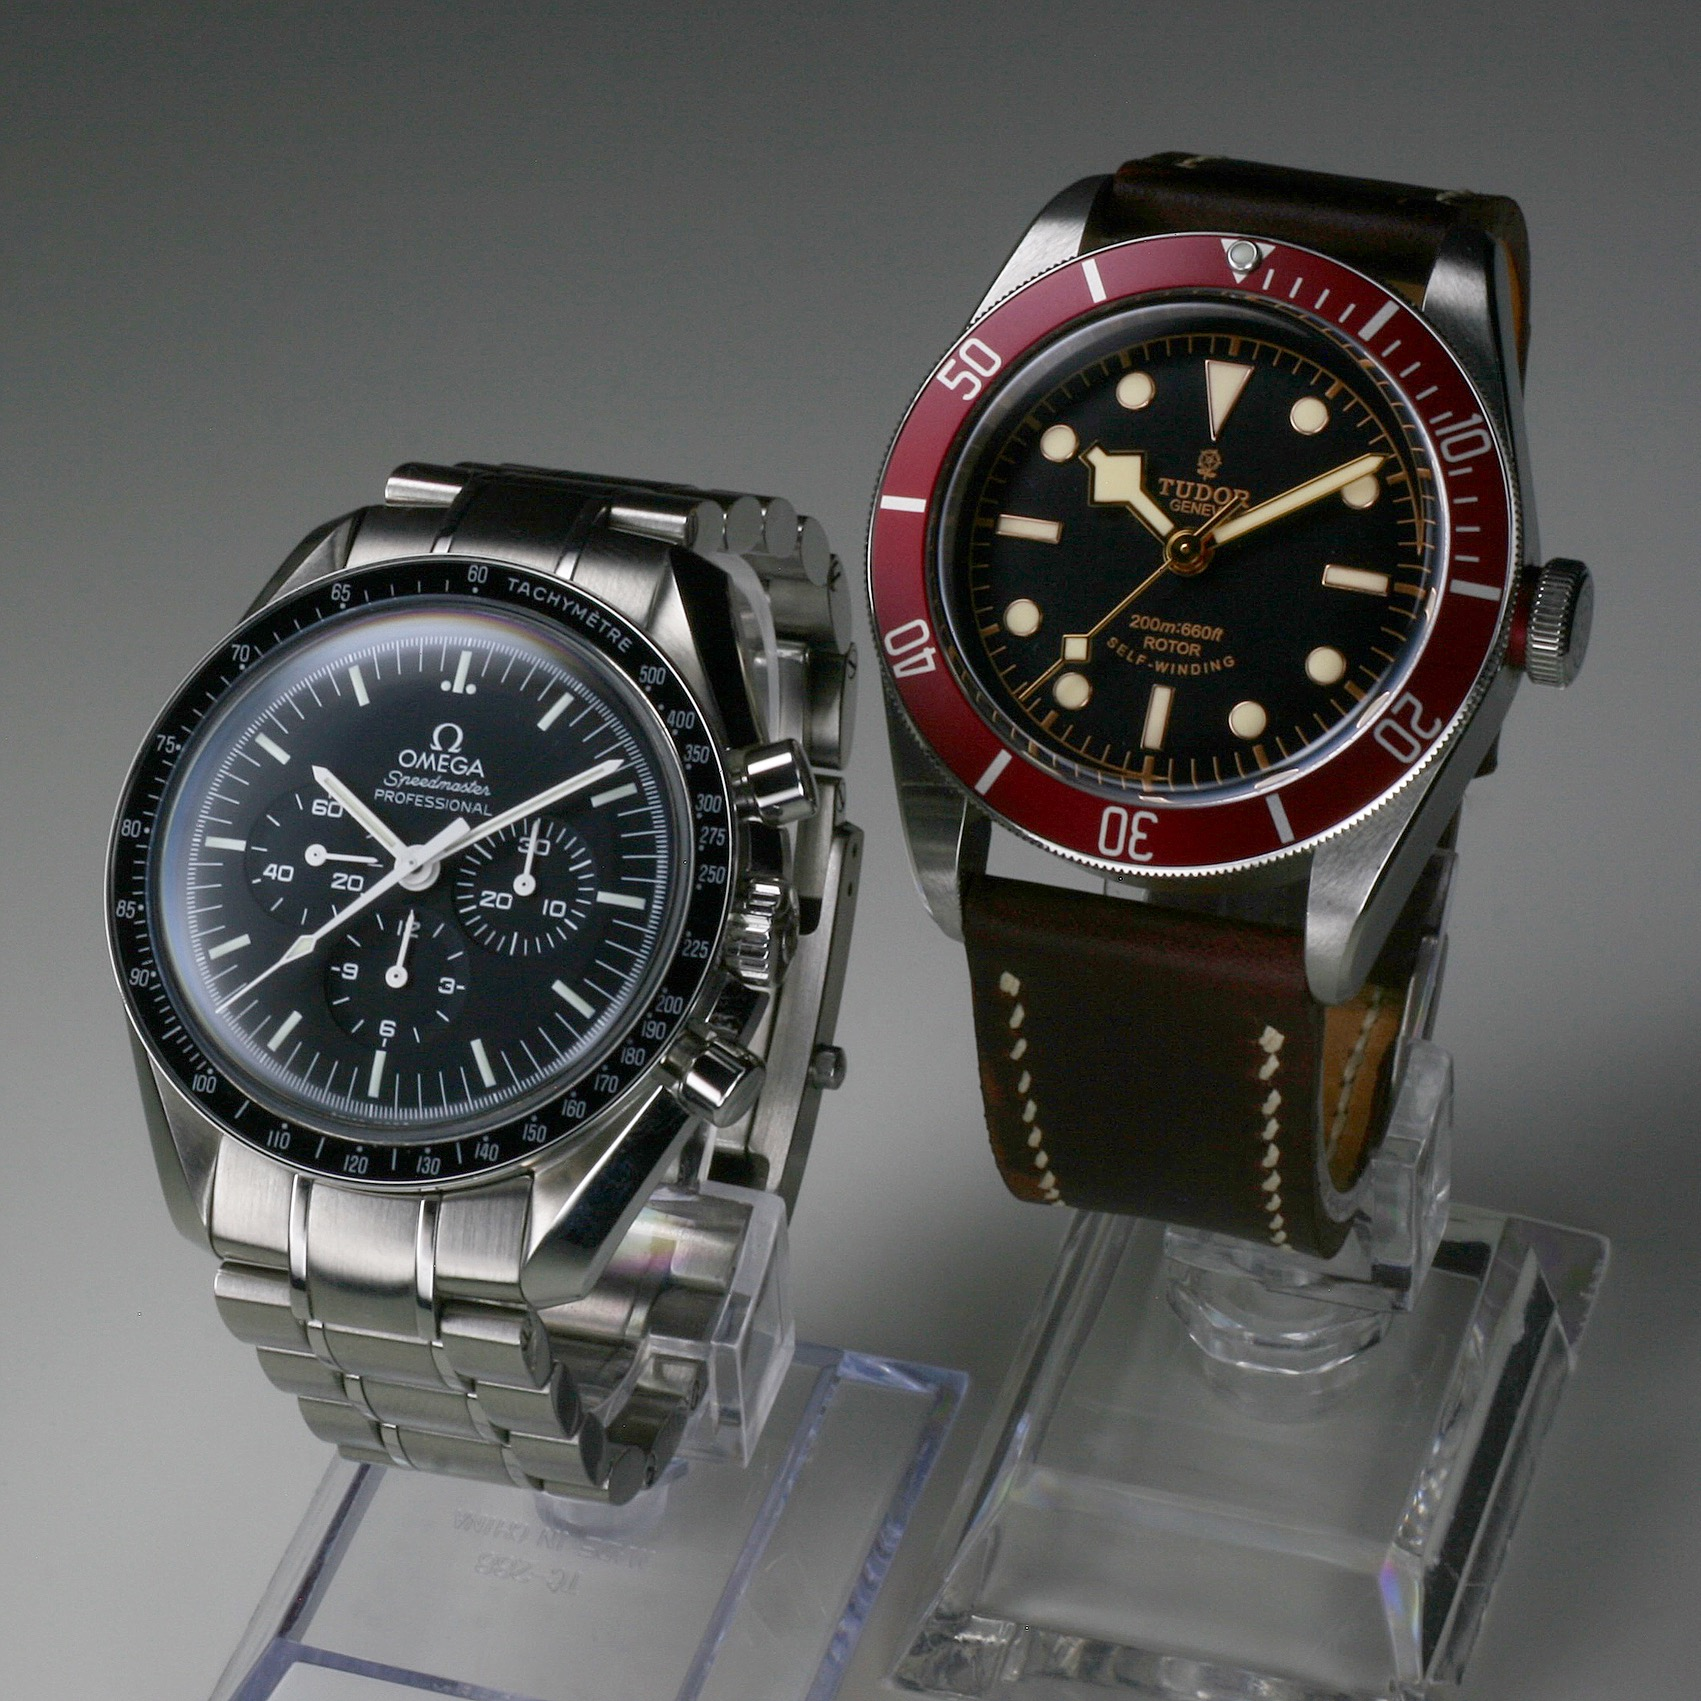 Omega Speedmaster Professional and Tudor Black Bay Red